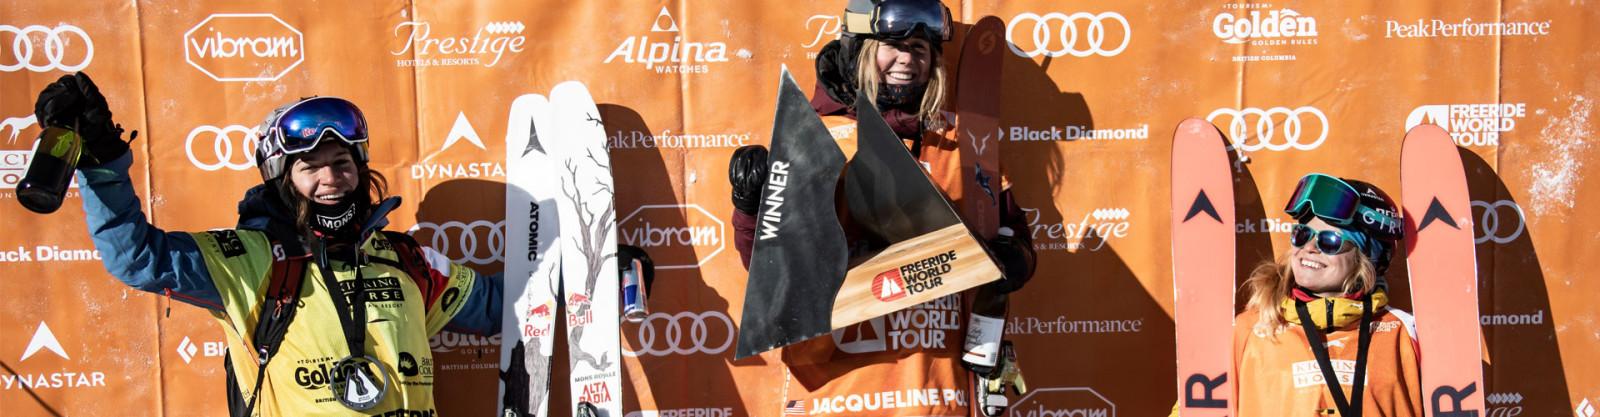 Hazel Birnbaum on the podium of the Freeride World Tour in Kicking Horse.